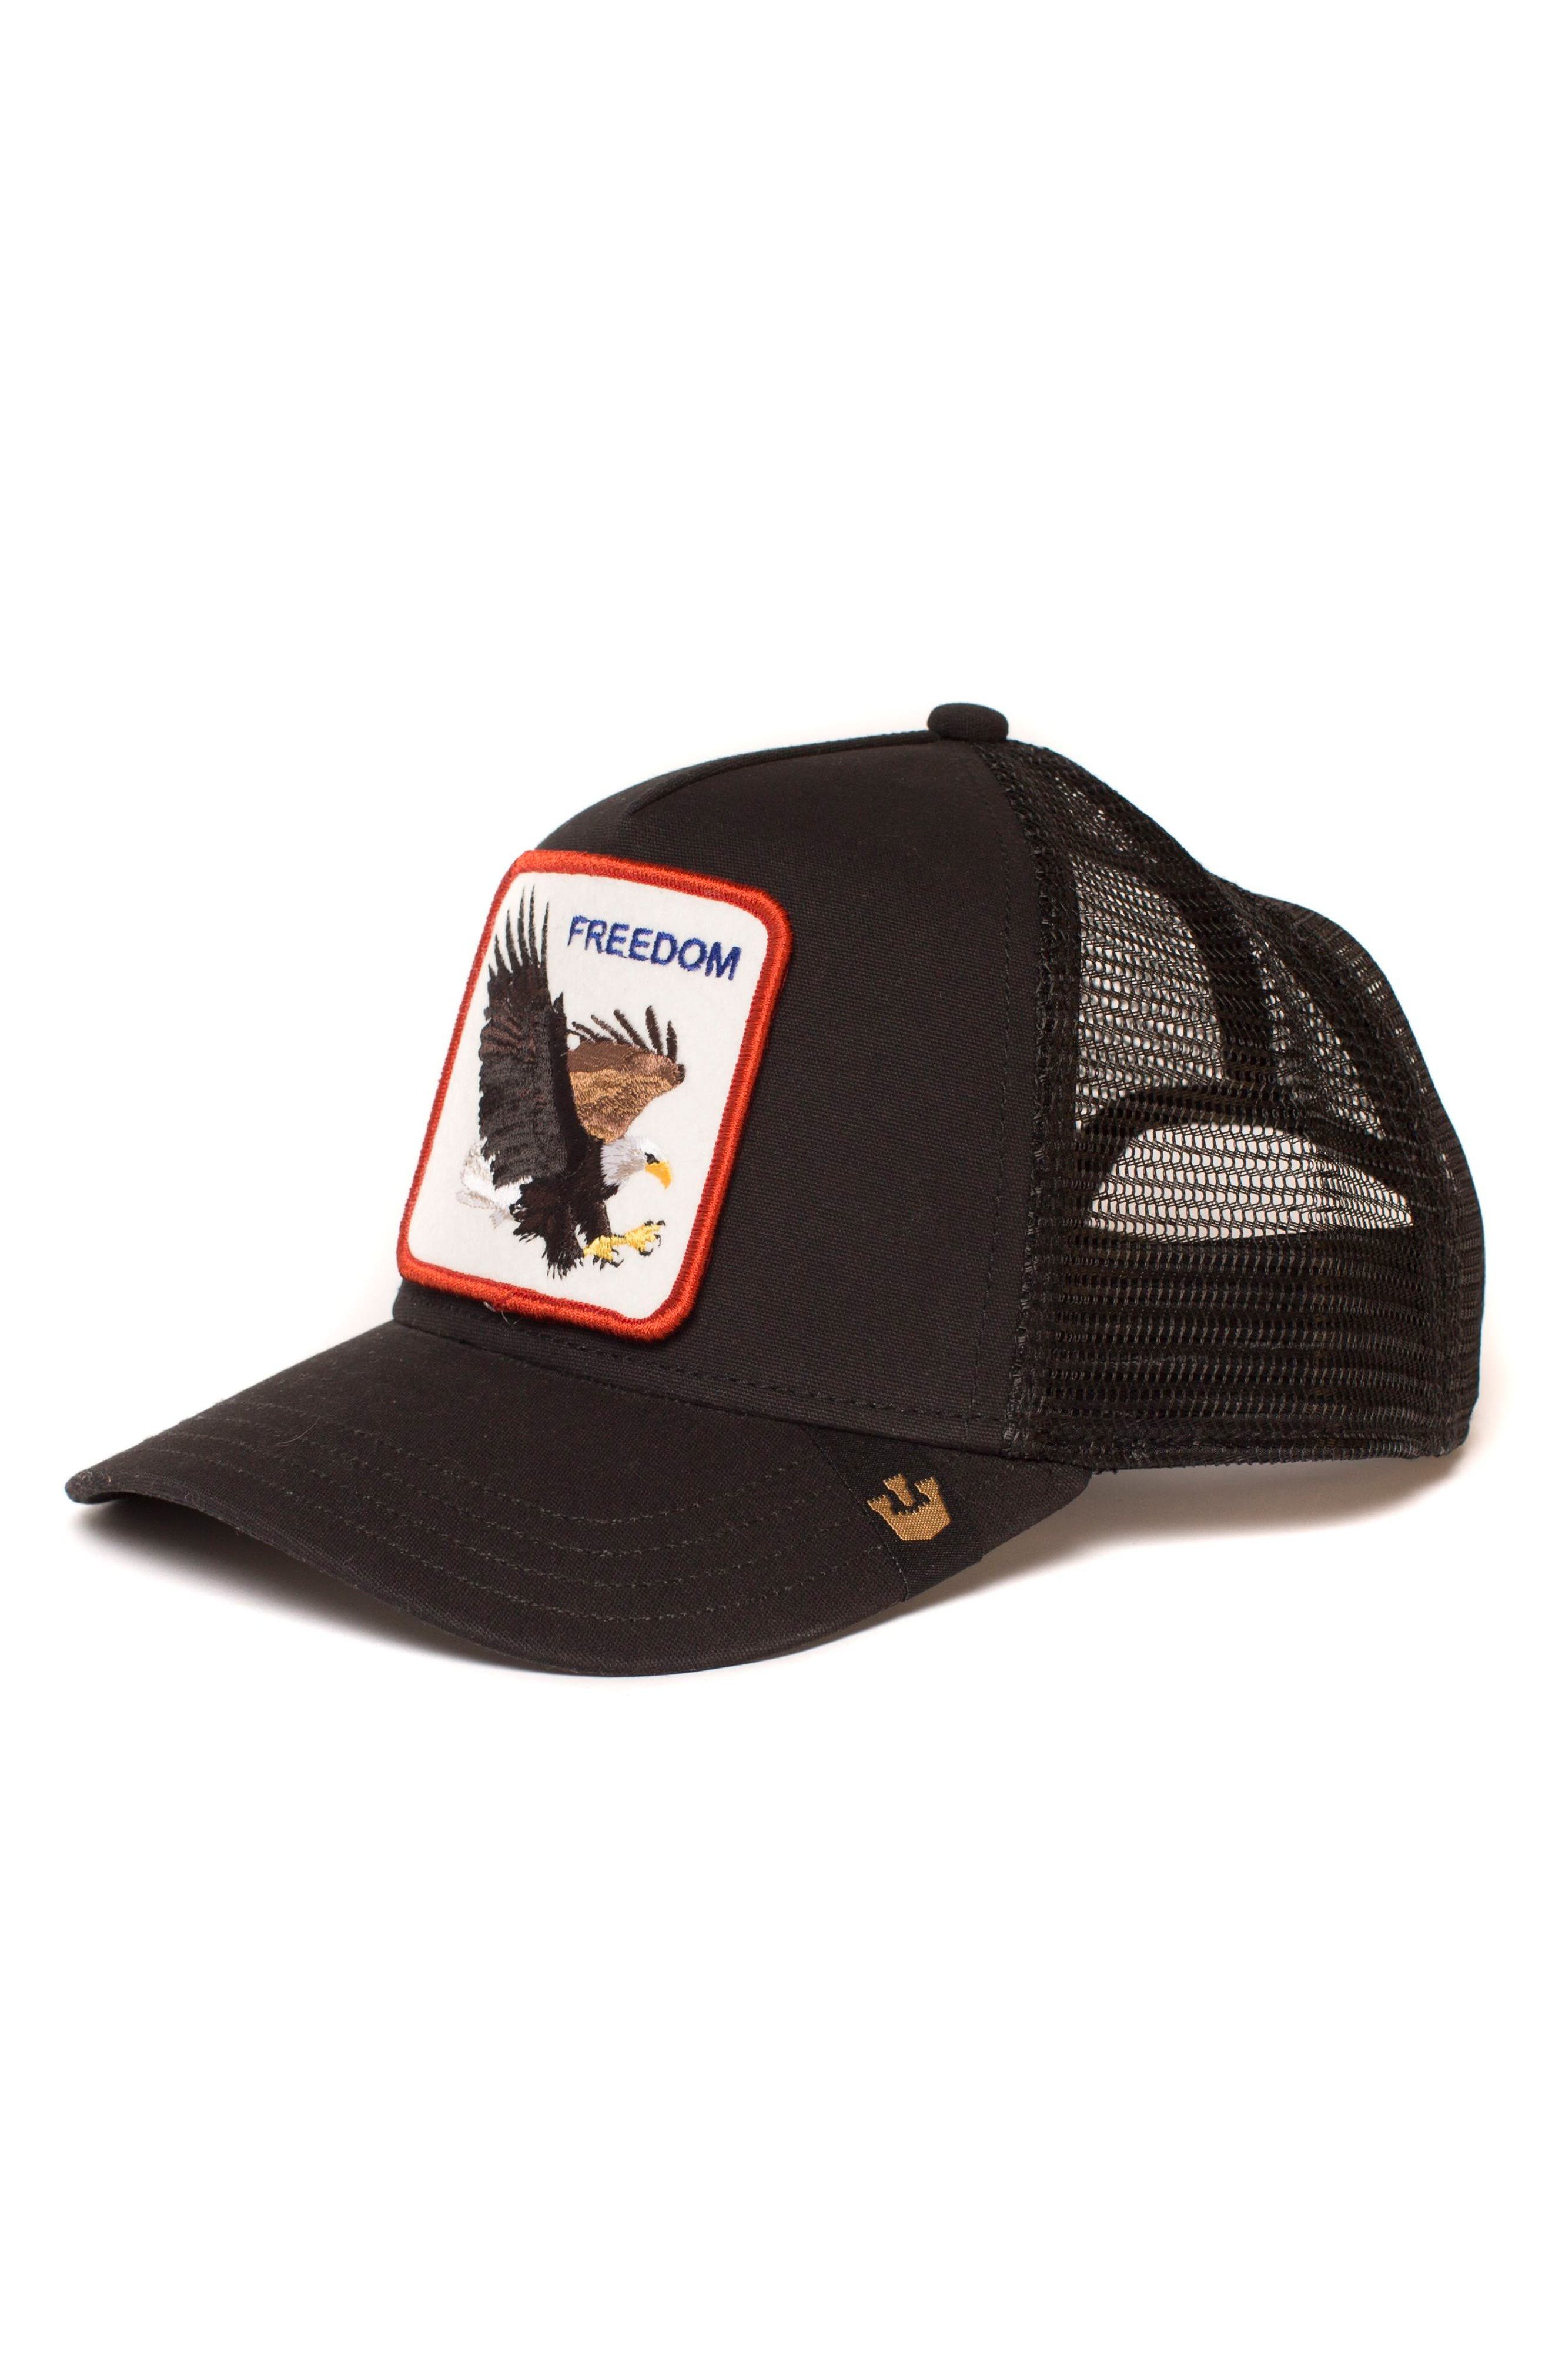 Freedom Trucker Hat,                         Main,                         color, Black